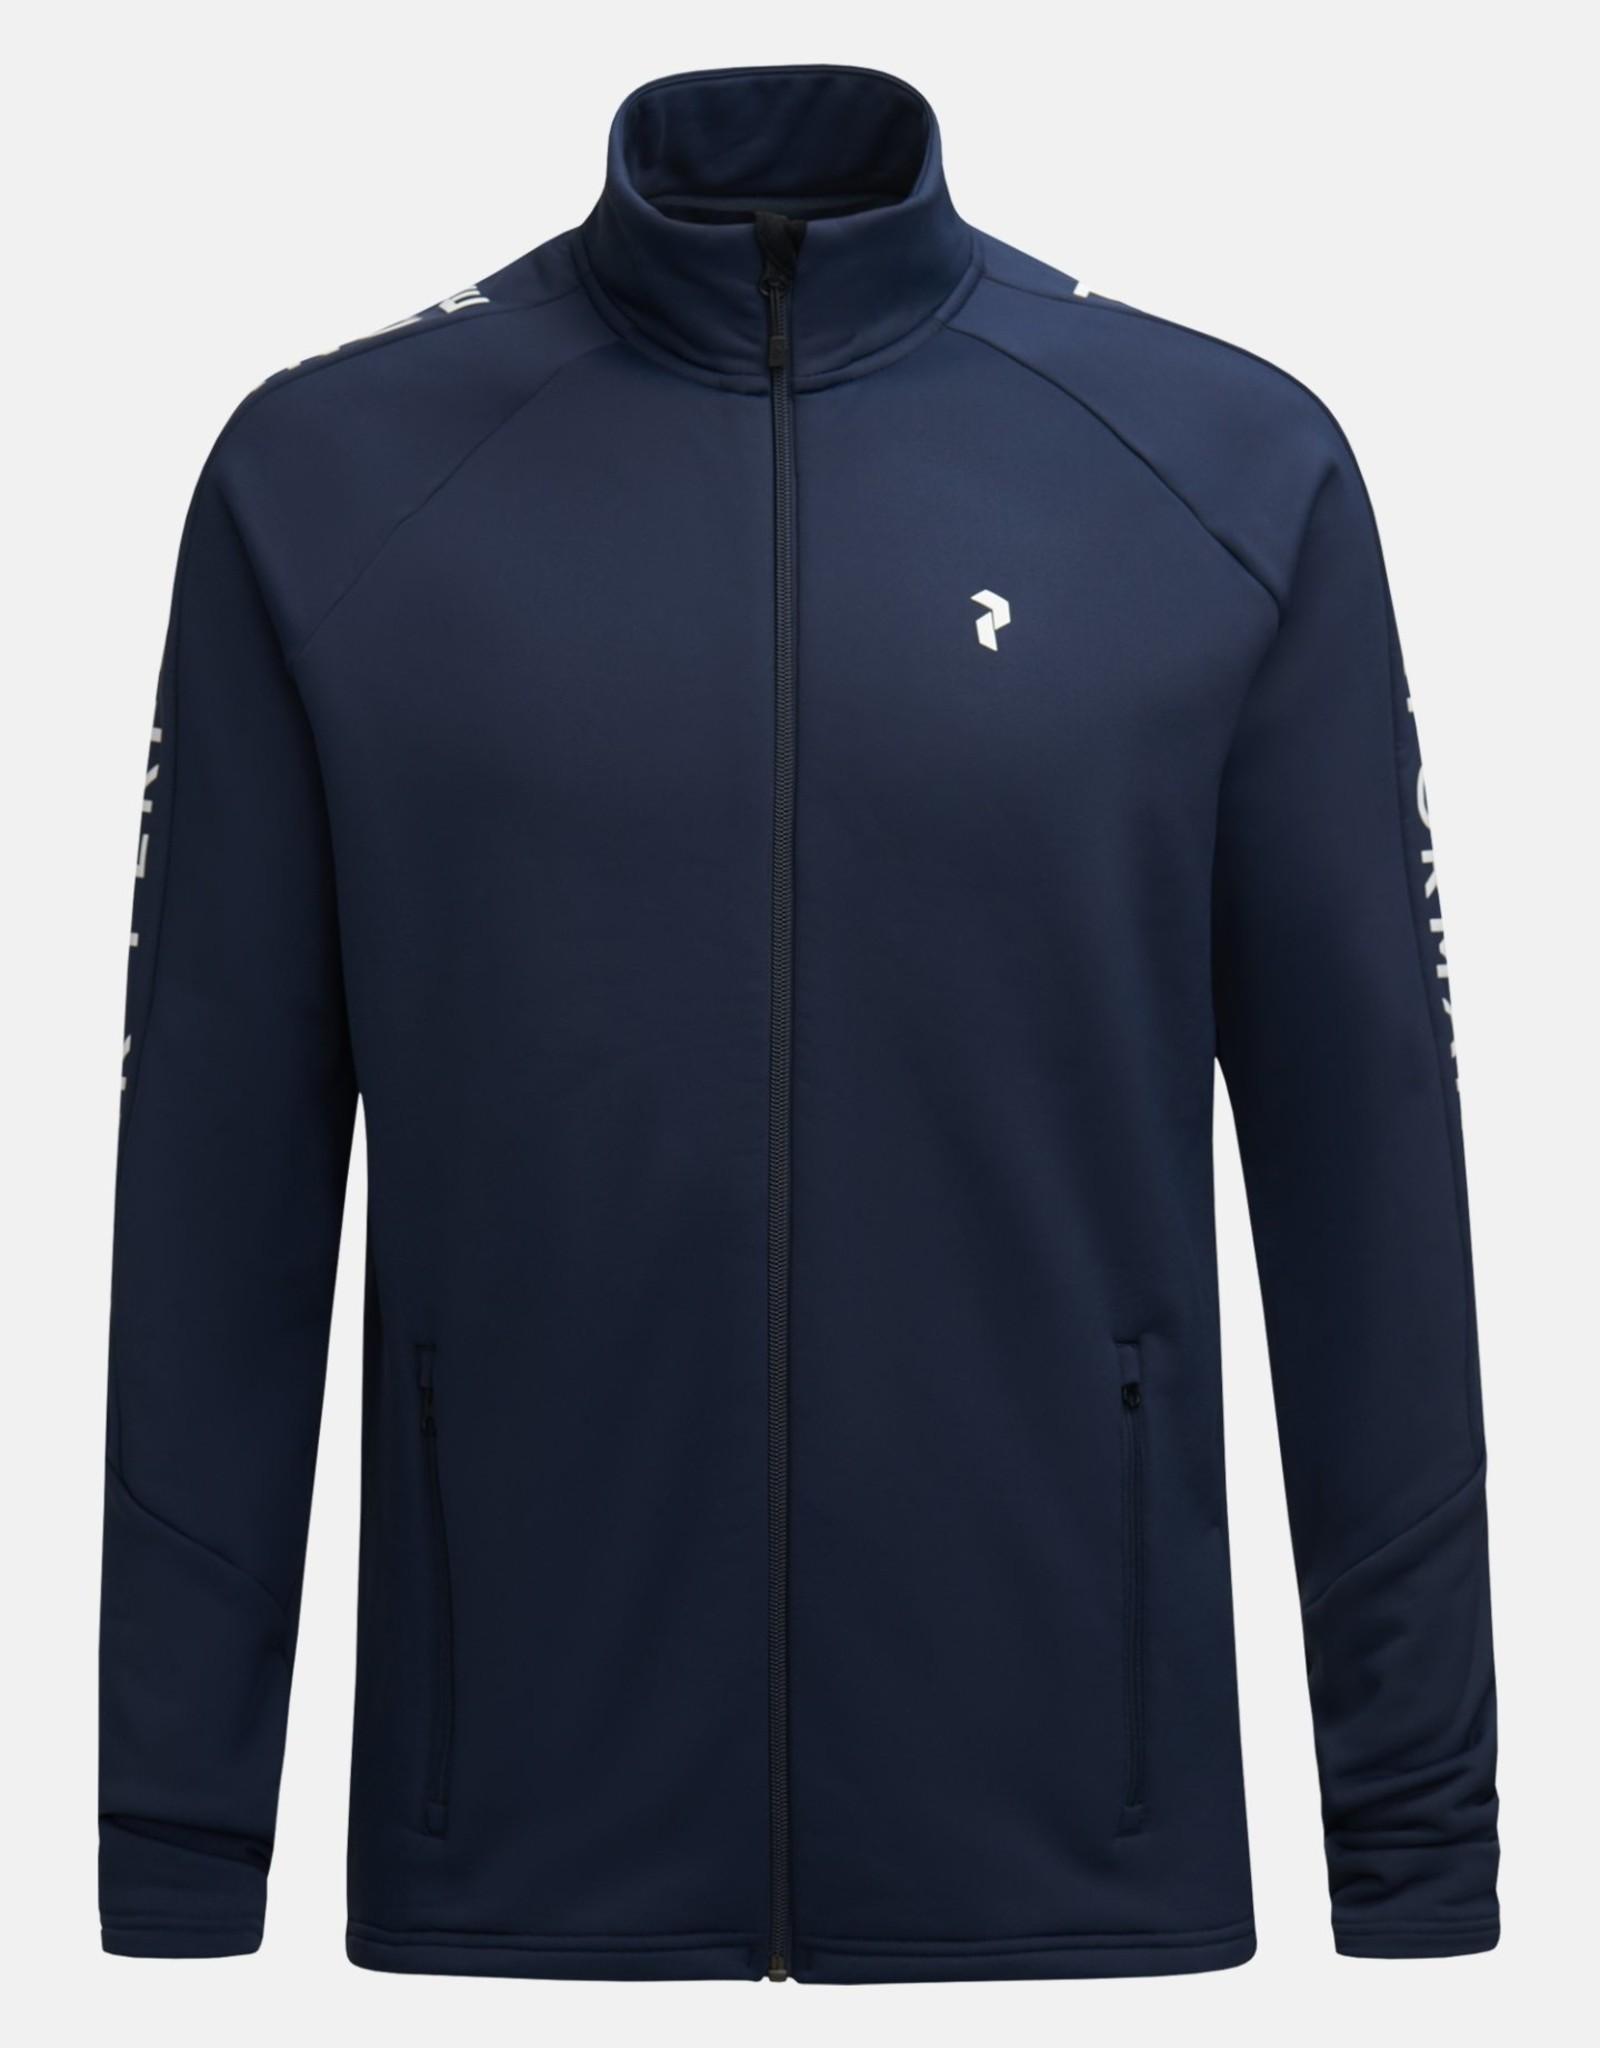 Peak Performance Rider zip jacket heren (ref G66363046)